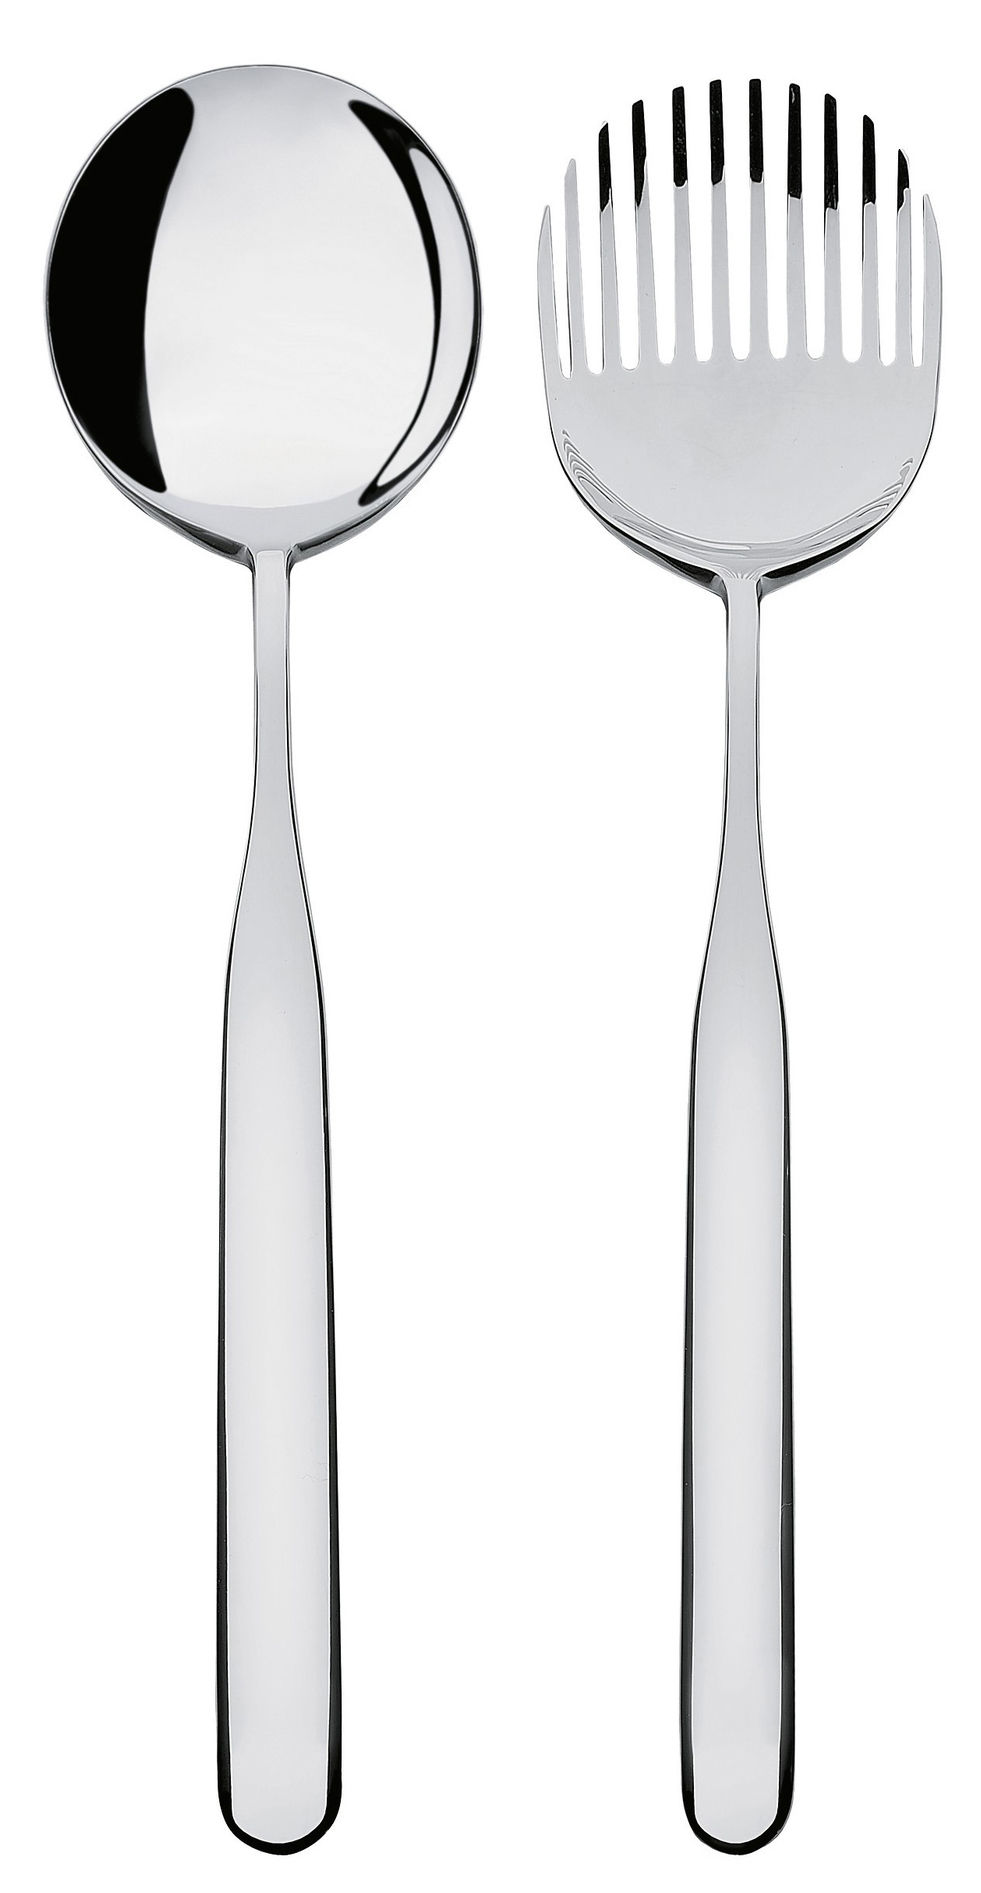 Couverts salade collo alto acier poli miroir alessi for Acier poli miroir